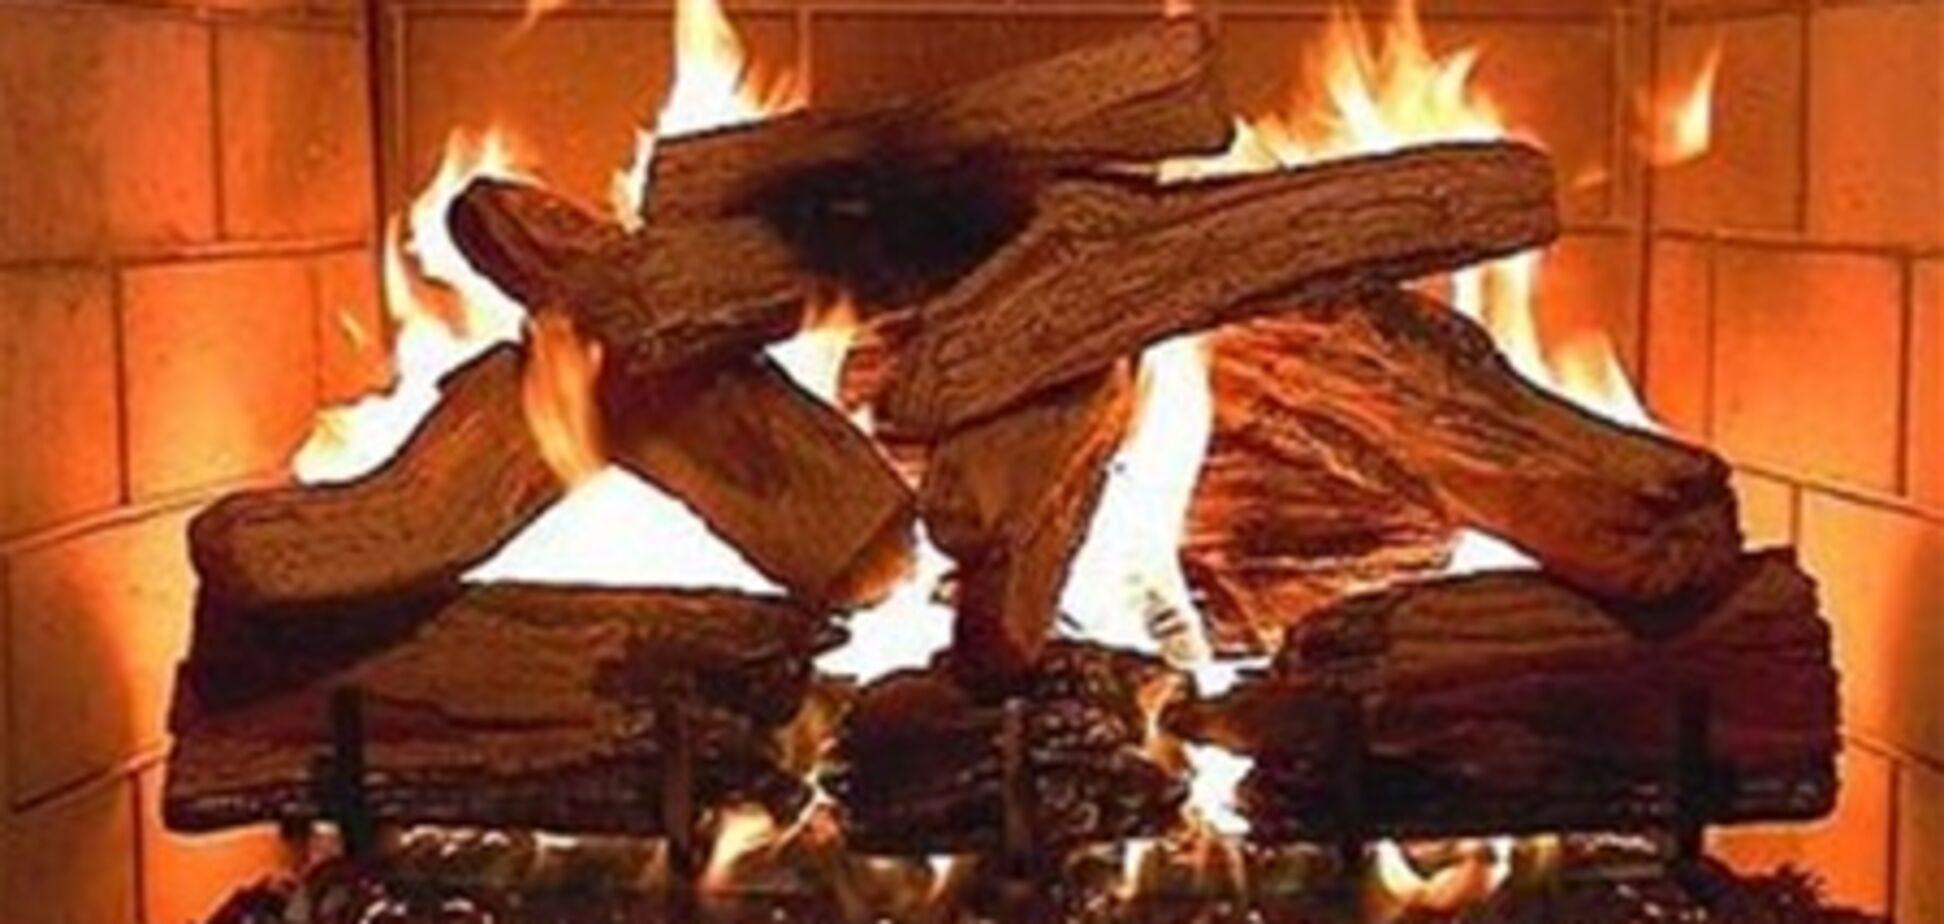 Да будет торф и древесина